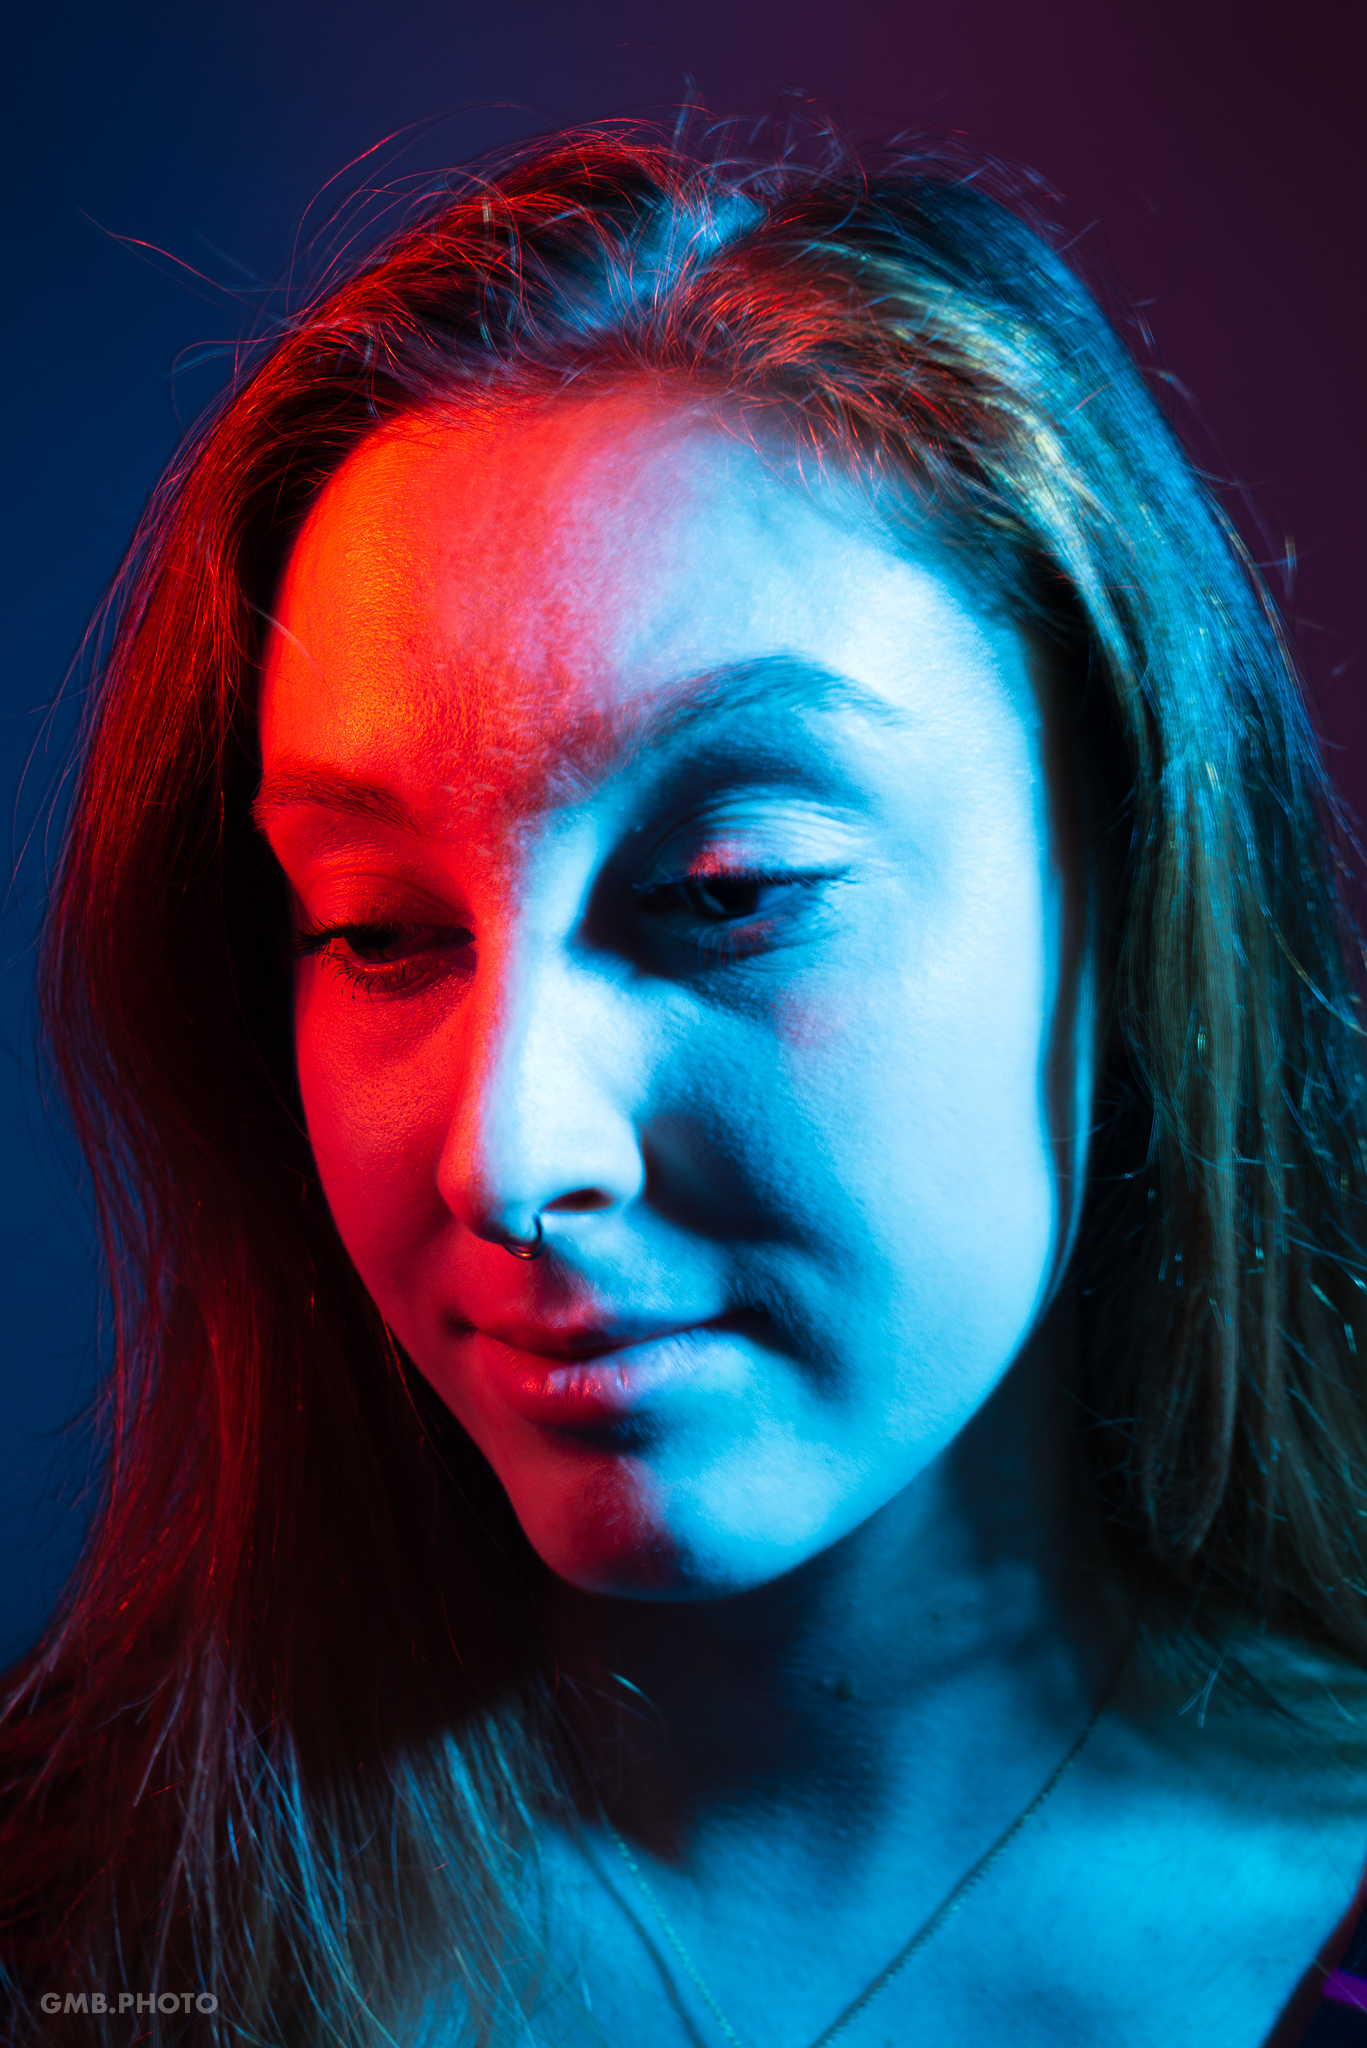 Mabey, Georgina - Fifteen Minute Portrait / Headshot Shoot